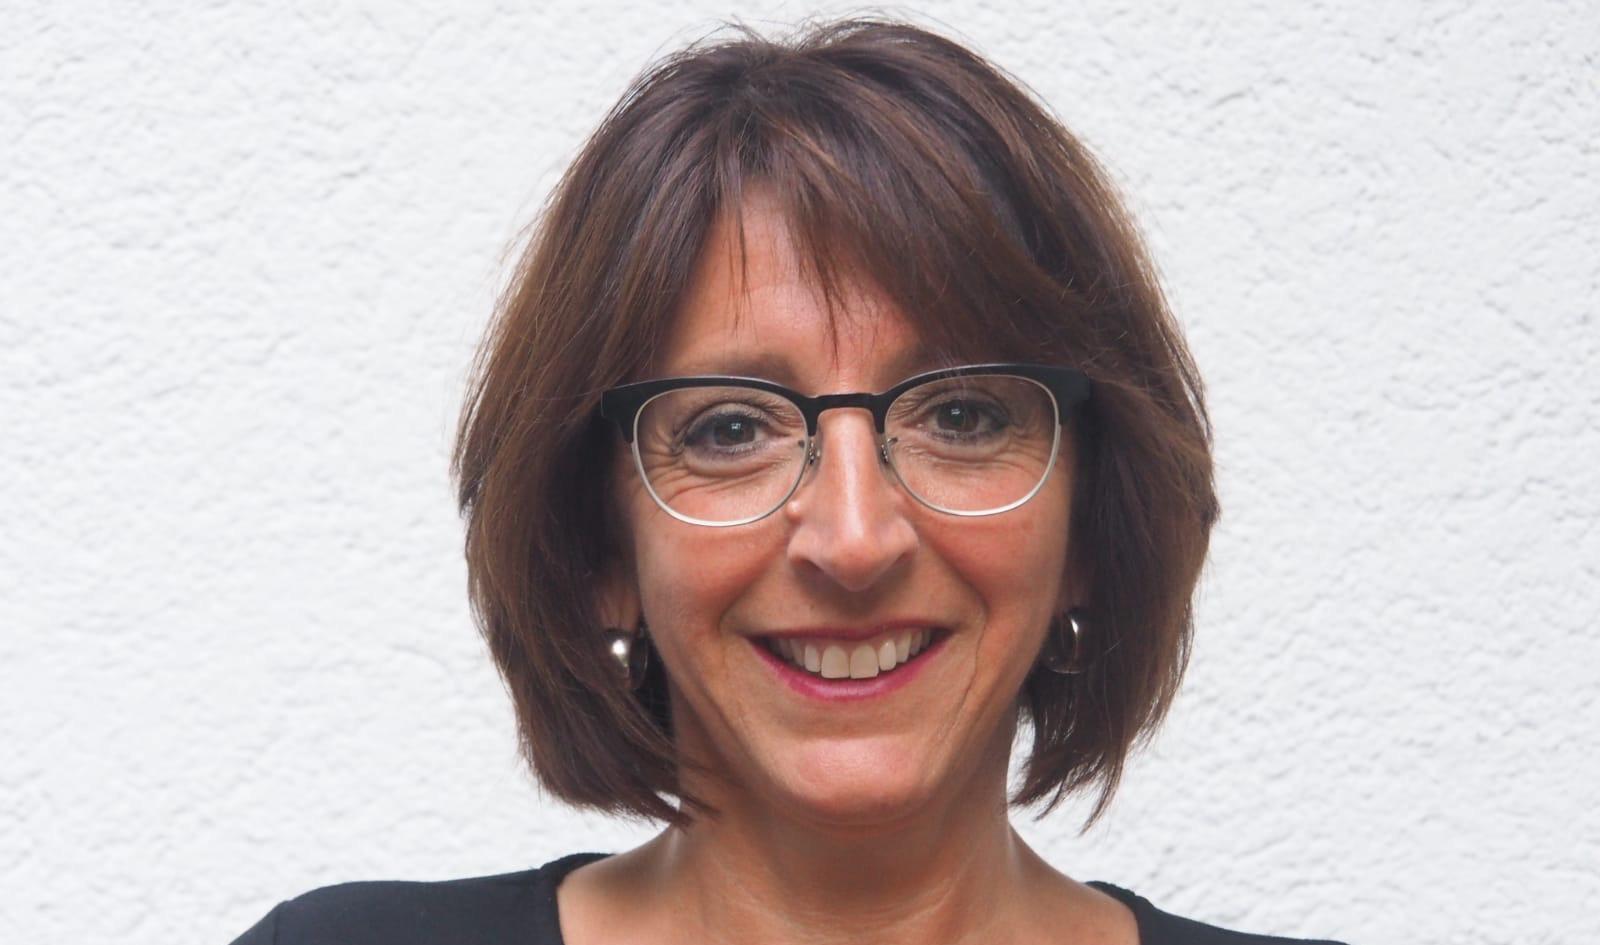 Maria Krauskopf